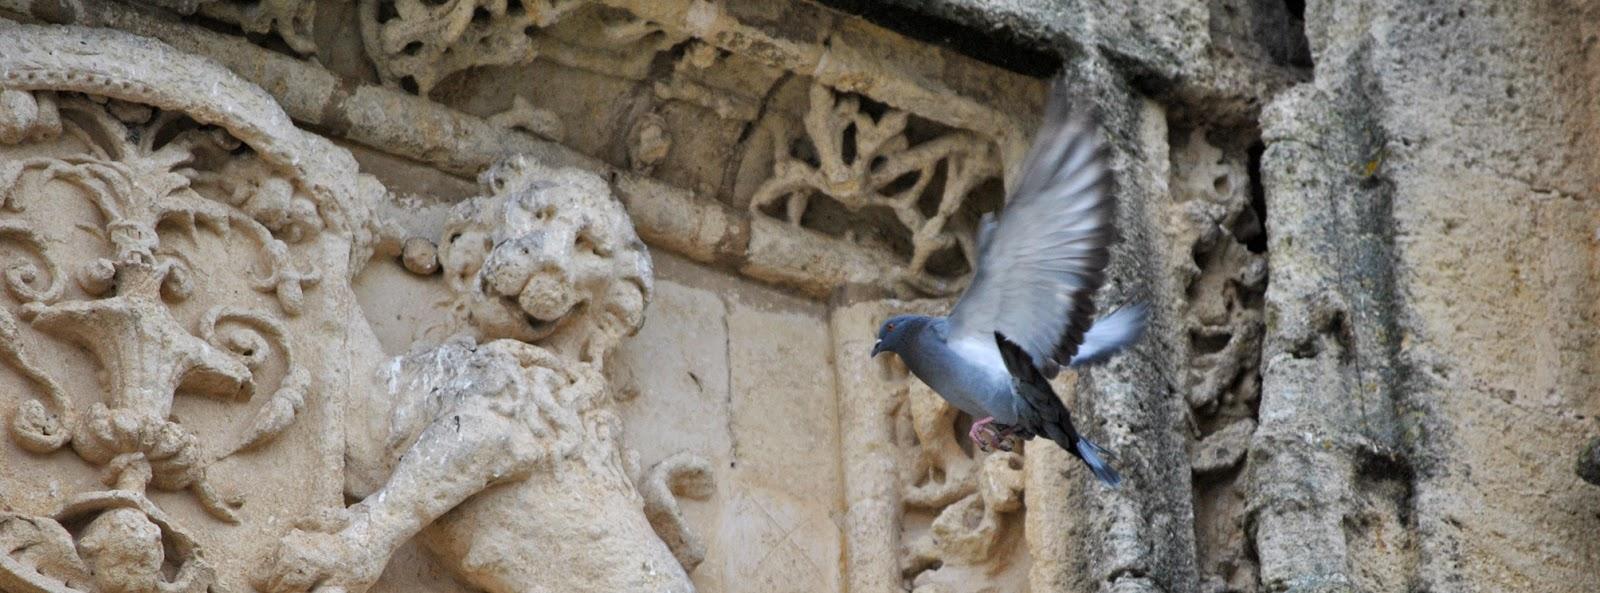 inocente chinesse pecho grande en Cádiz